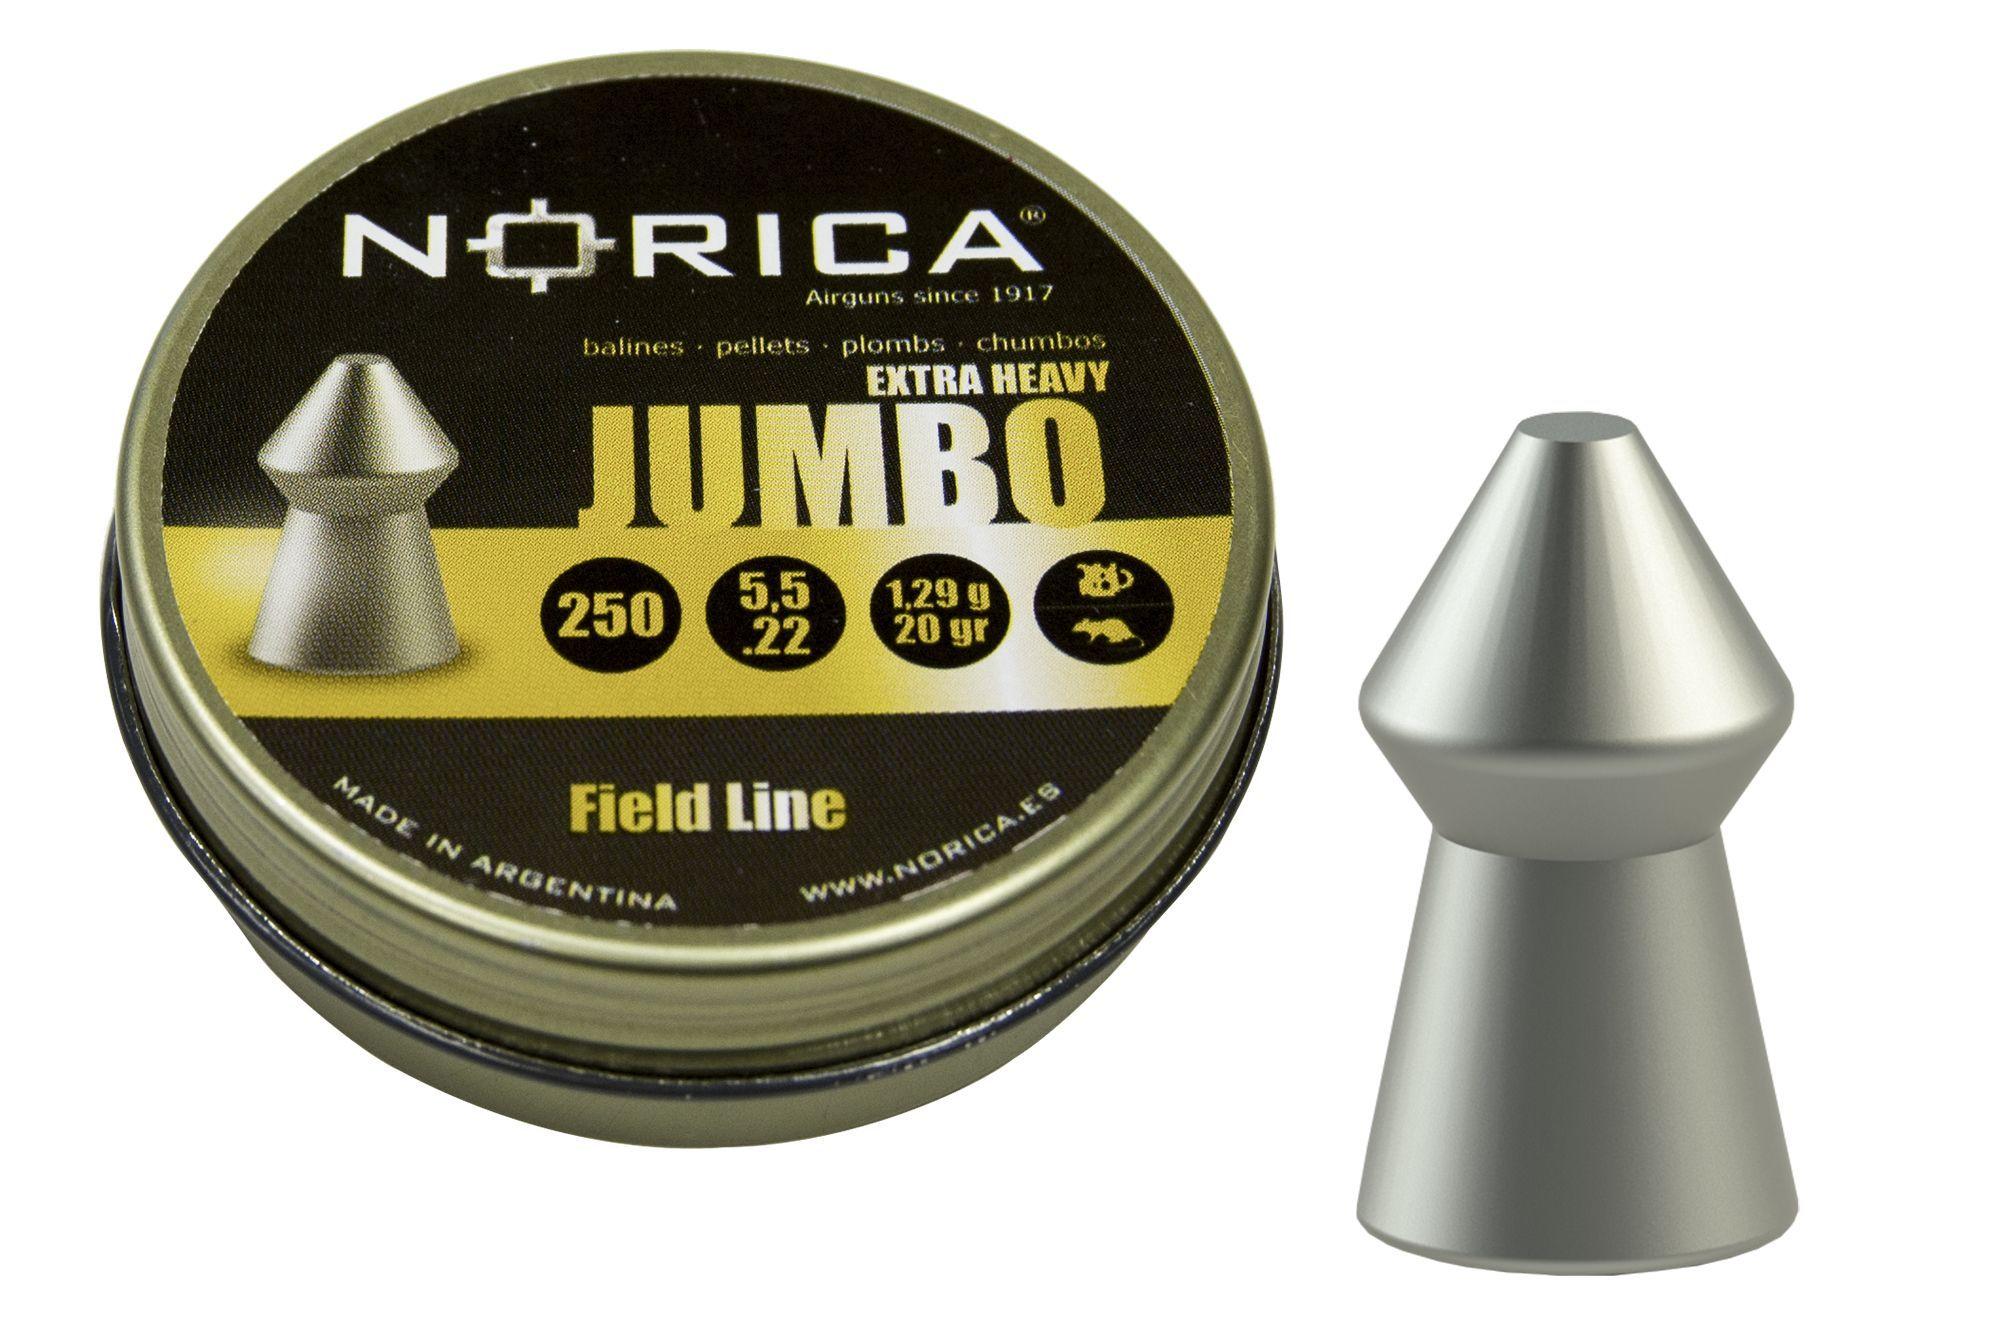 Norica Jumbo Extra Heavy .177 (4.5mm)